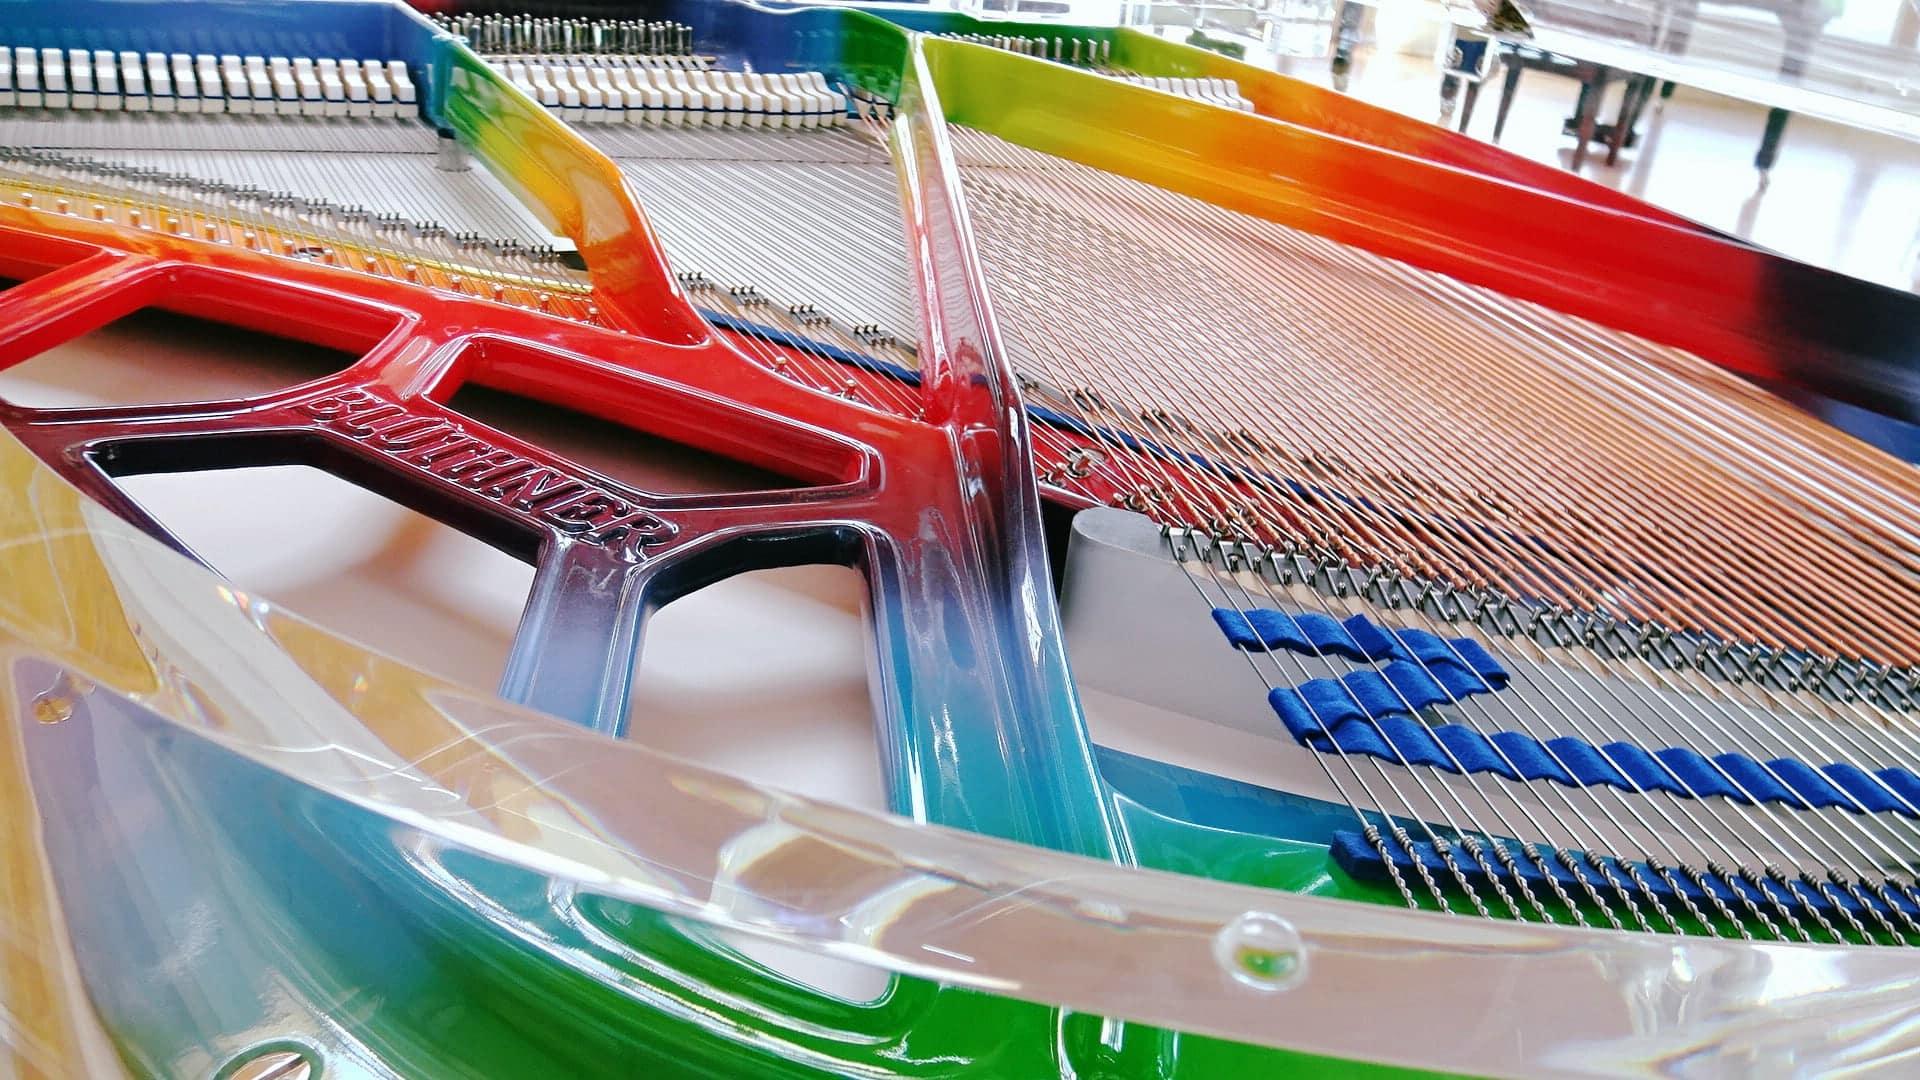 Idyloic piano interior